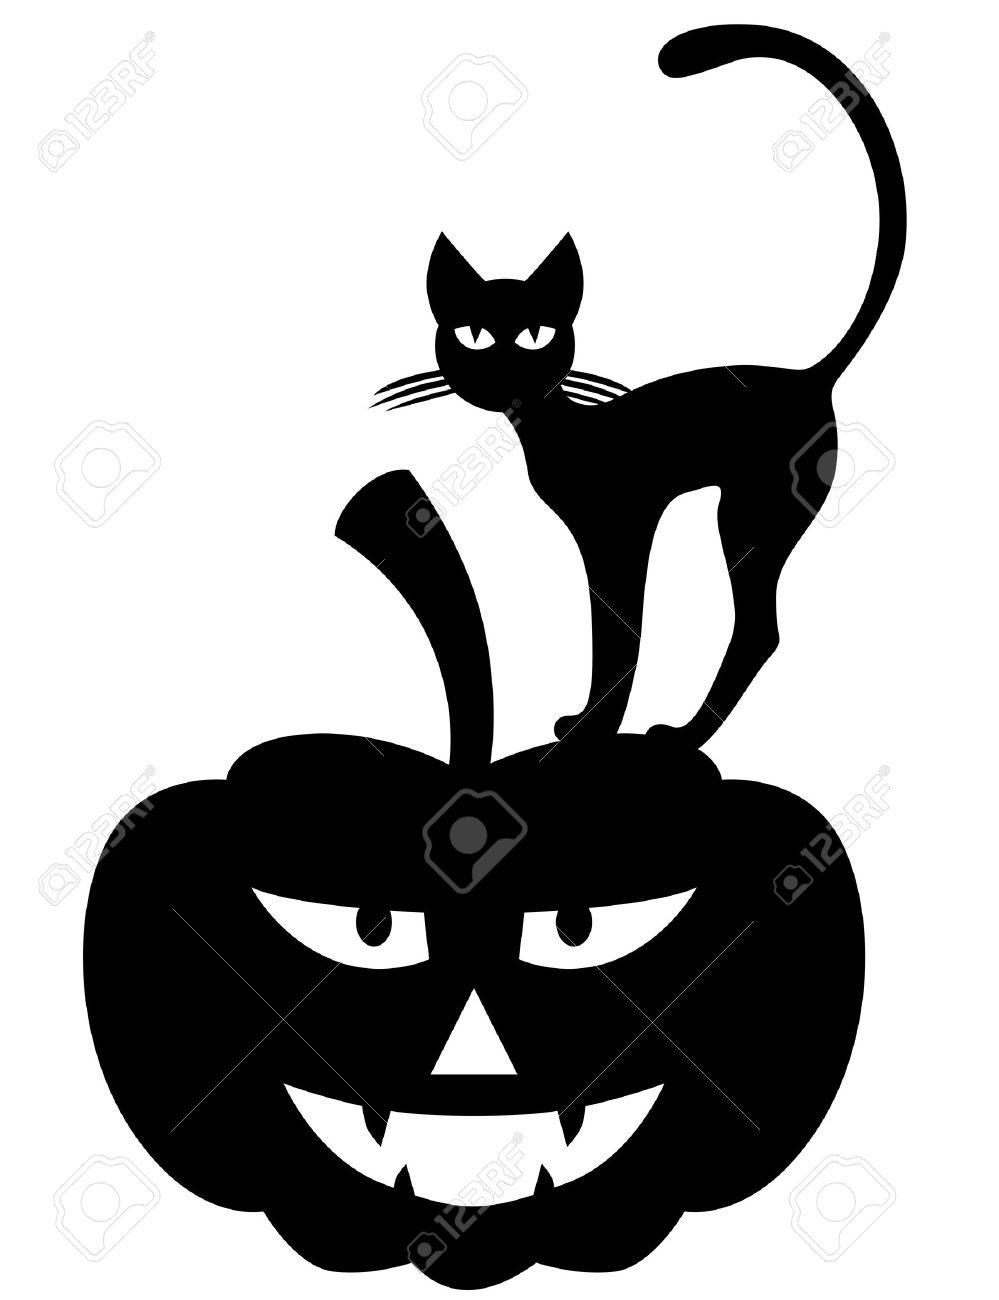 999x1300 Vector Illustrations Of Halloween Silhouette Black Cat On Pumpkin